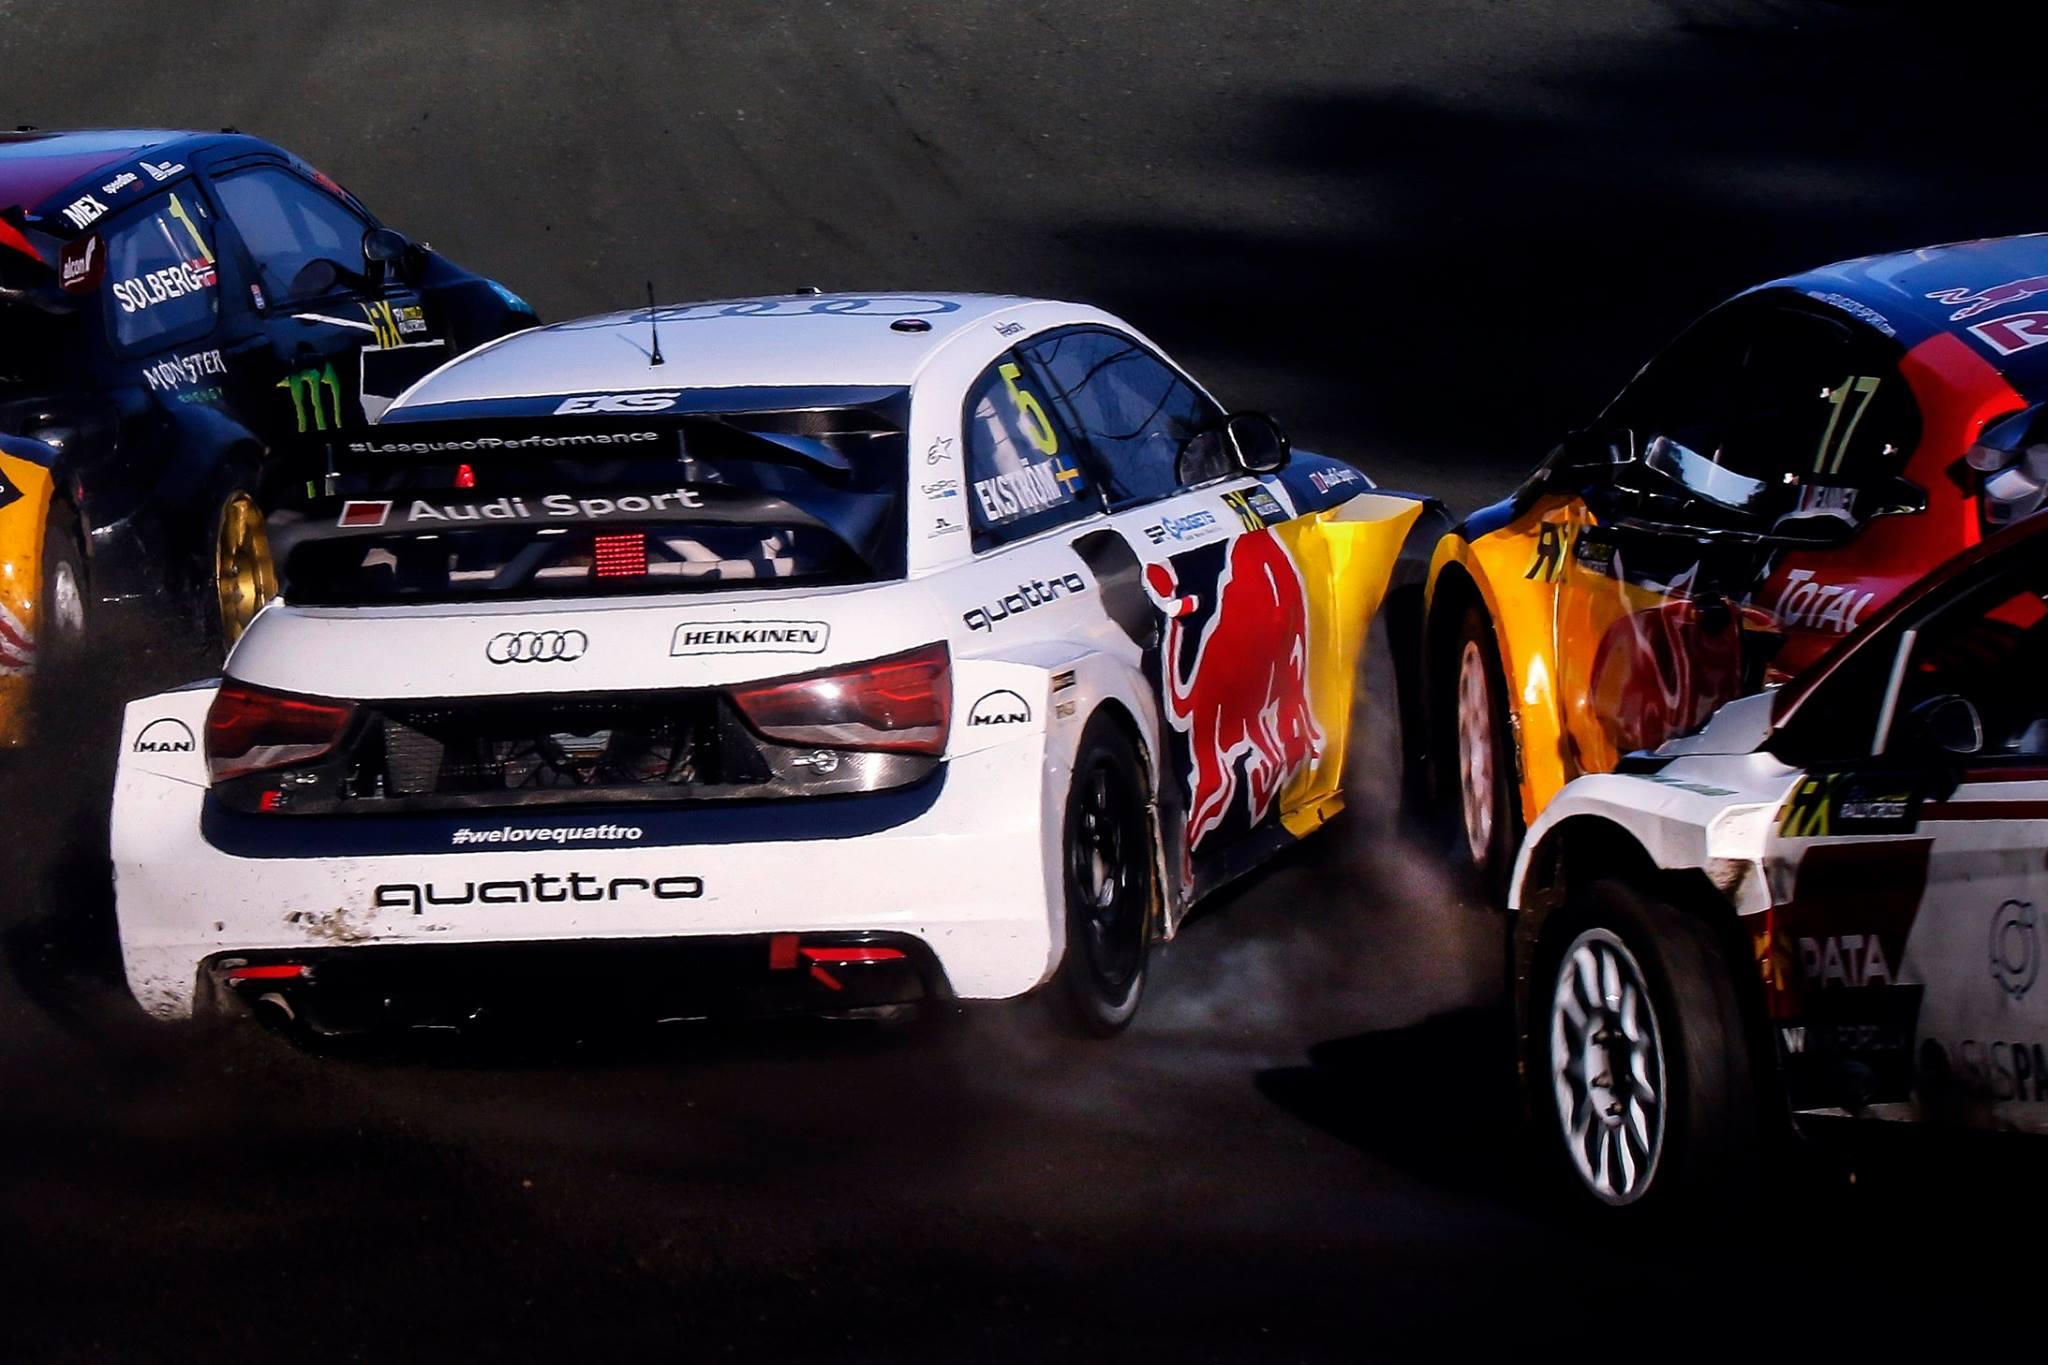 FIA Rallycross: Ekstrom Crowned 2016 World RX Champion at Estering ...